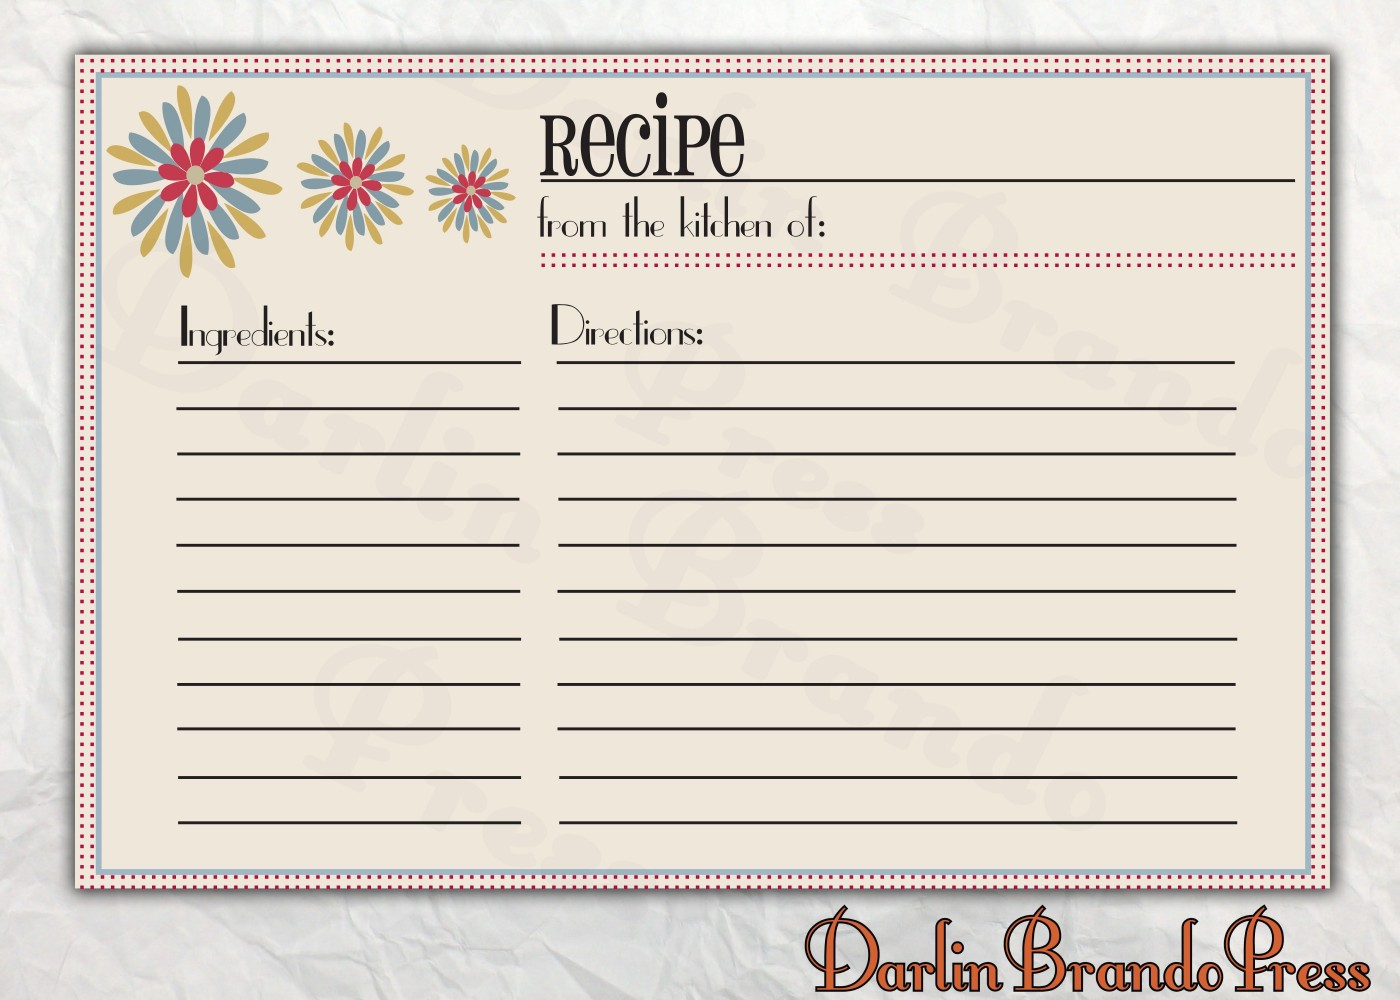 006 Astounding 4 X 6 Recipe Card Template Microsoft Word Inspiration 1400